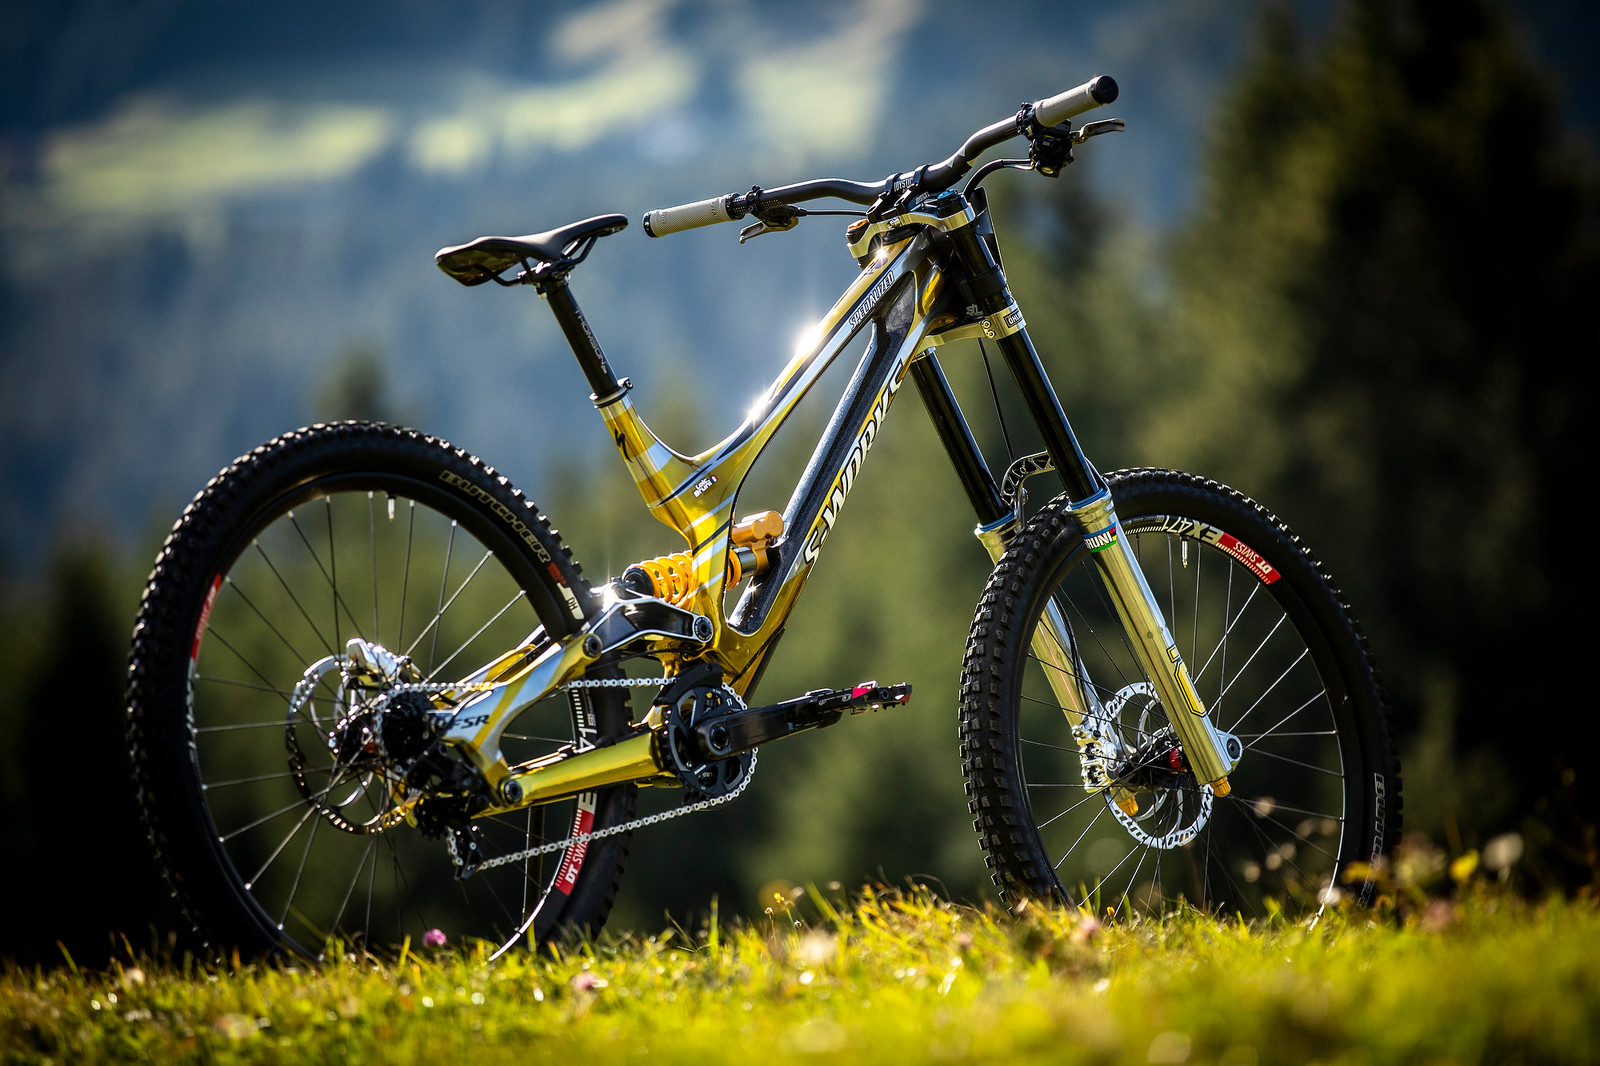 Mr. Sparkle - WORLD CHAMPS BIKE - Loic Bruni's Specialized Demo - Mountain Biking Pictures - Vital MTB